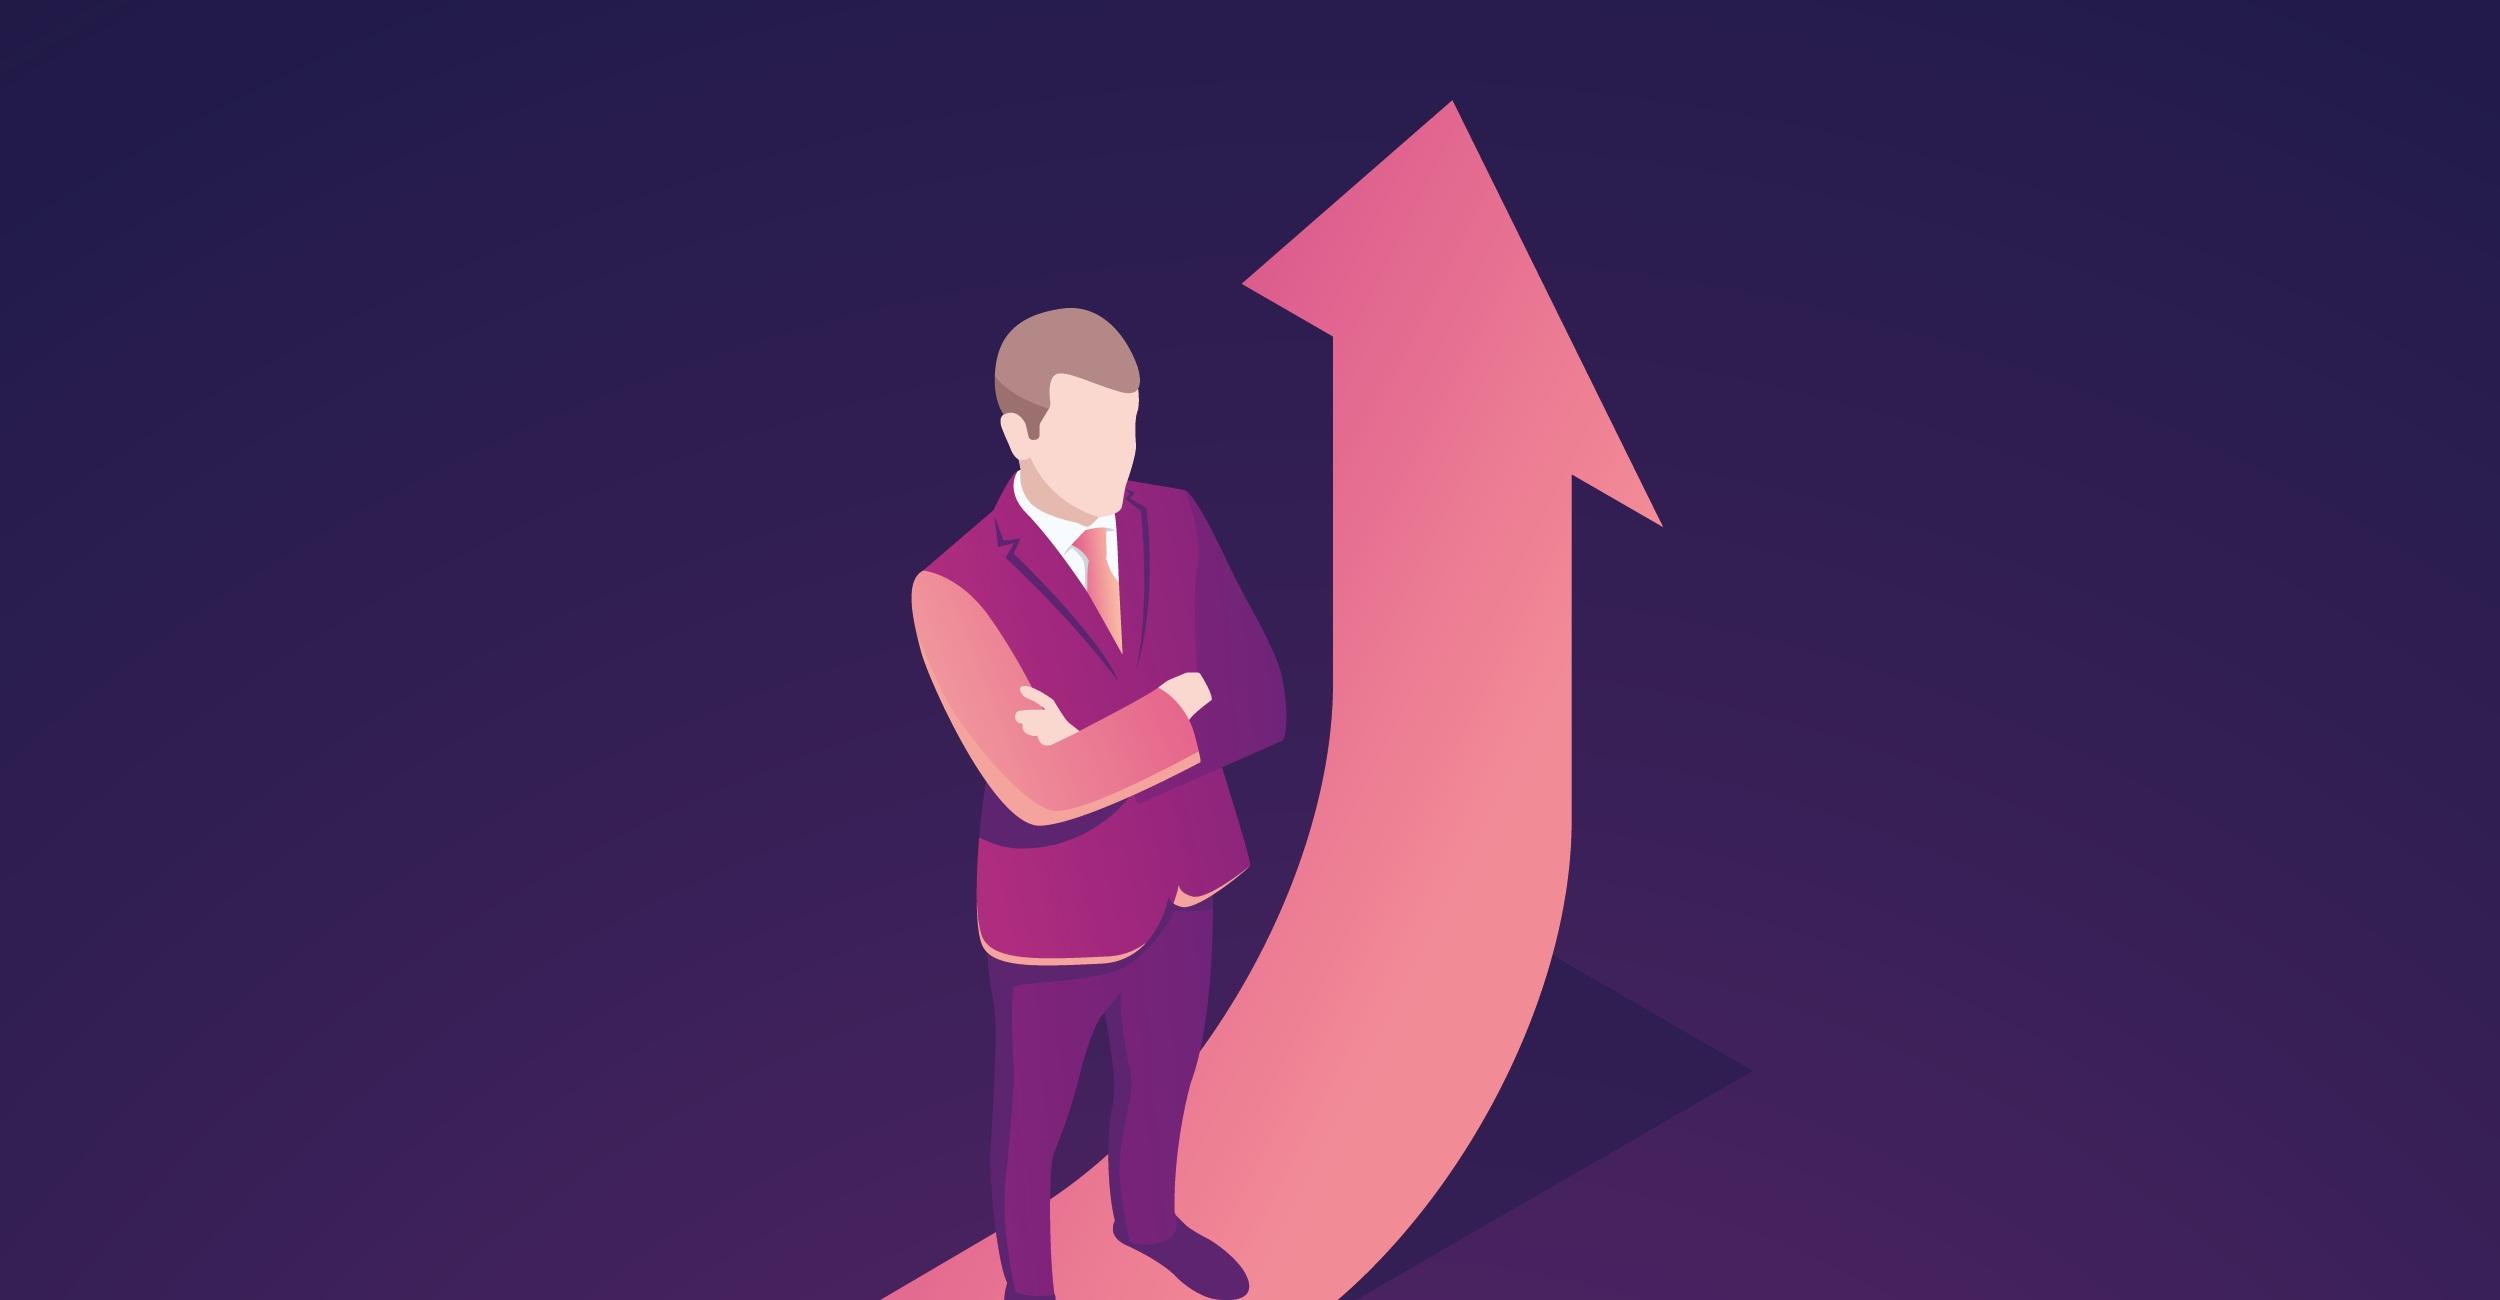 Growth Marketing / Hacking Workshop   Optimization. Strategy. Marketing. Growth.   TERMINE ANZEIGEN